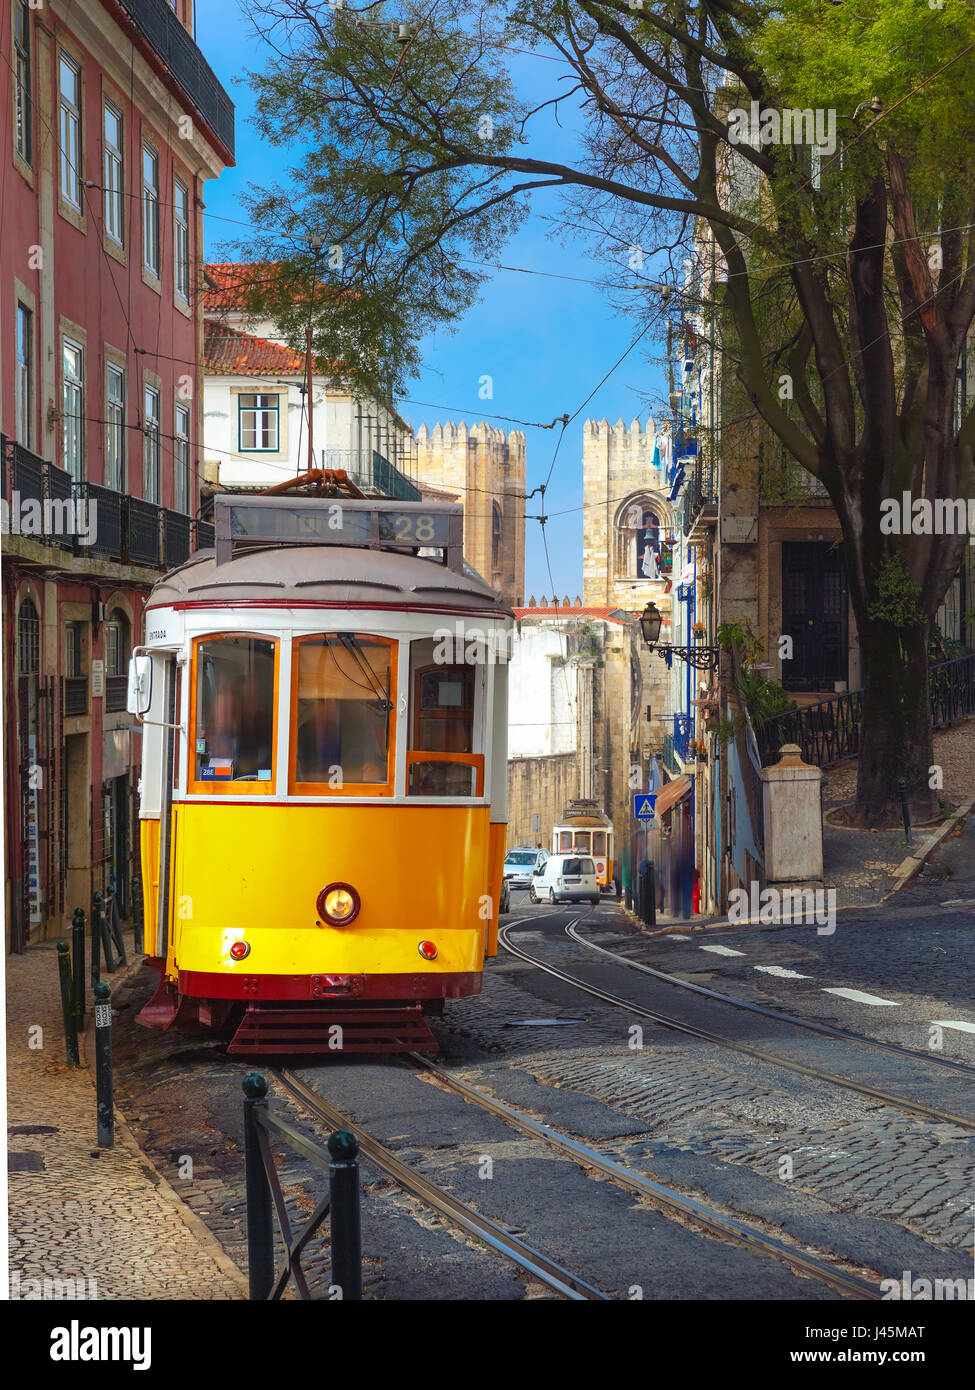 Yellow 28 tram in Alfama, Lisbon, Portugal - Stock Image